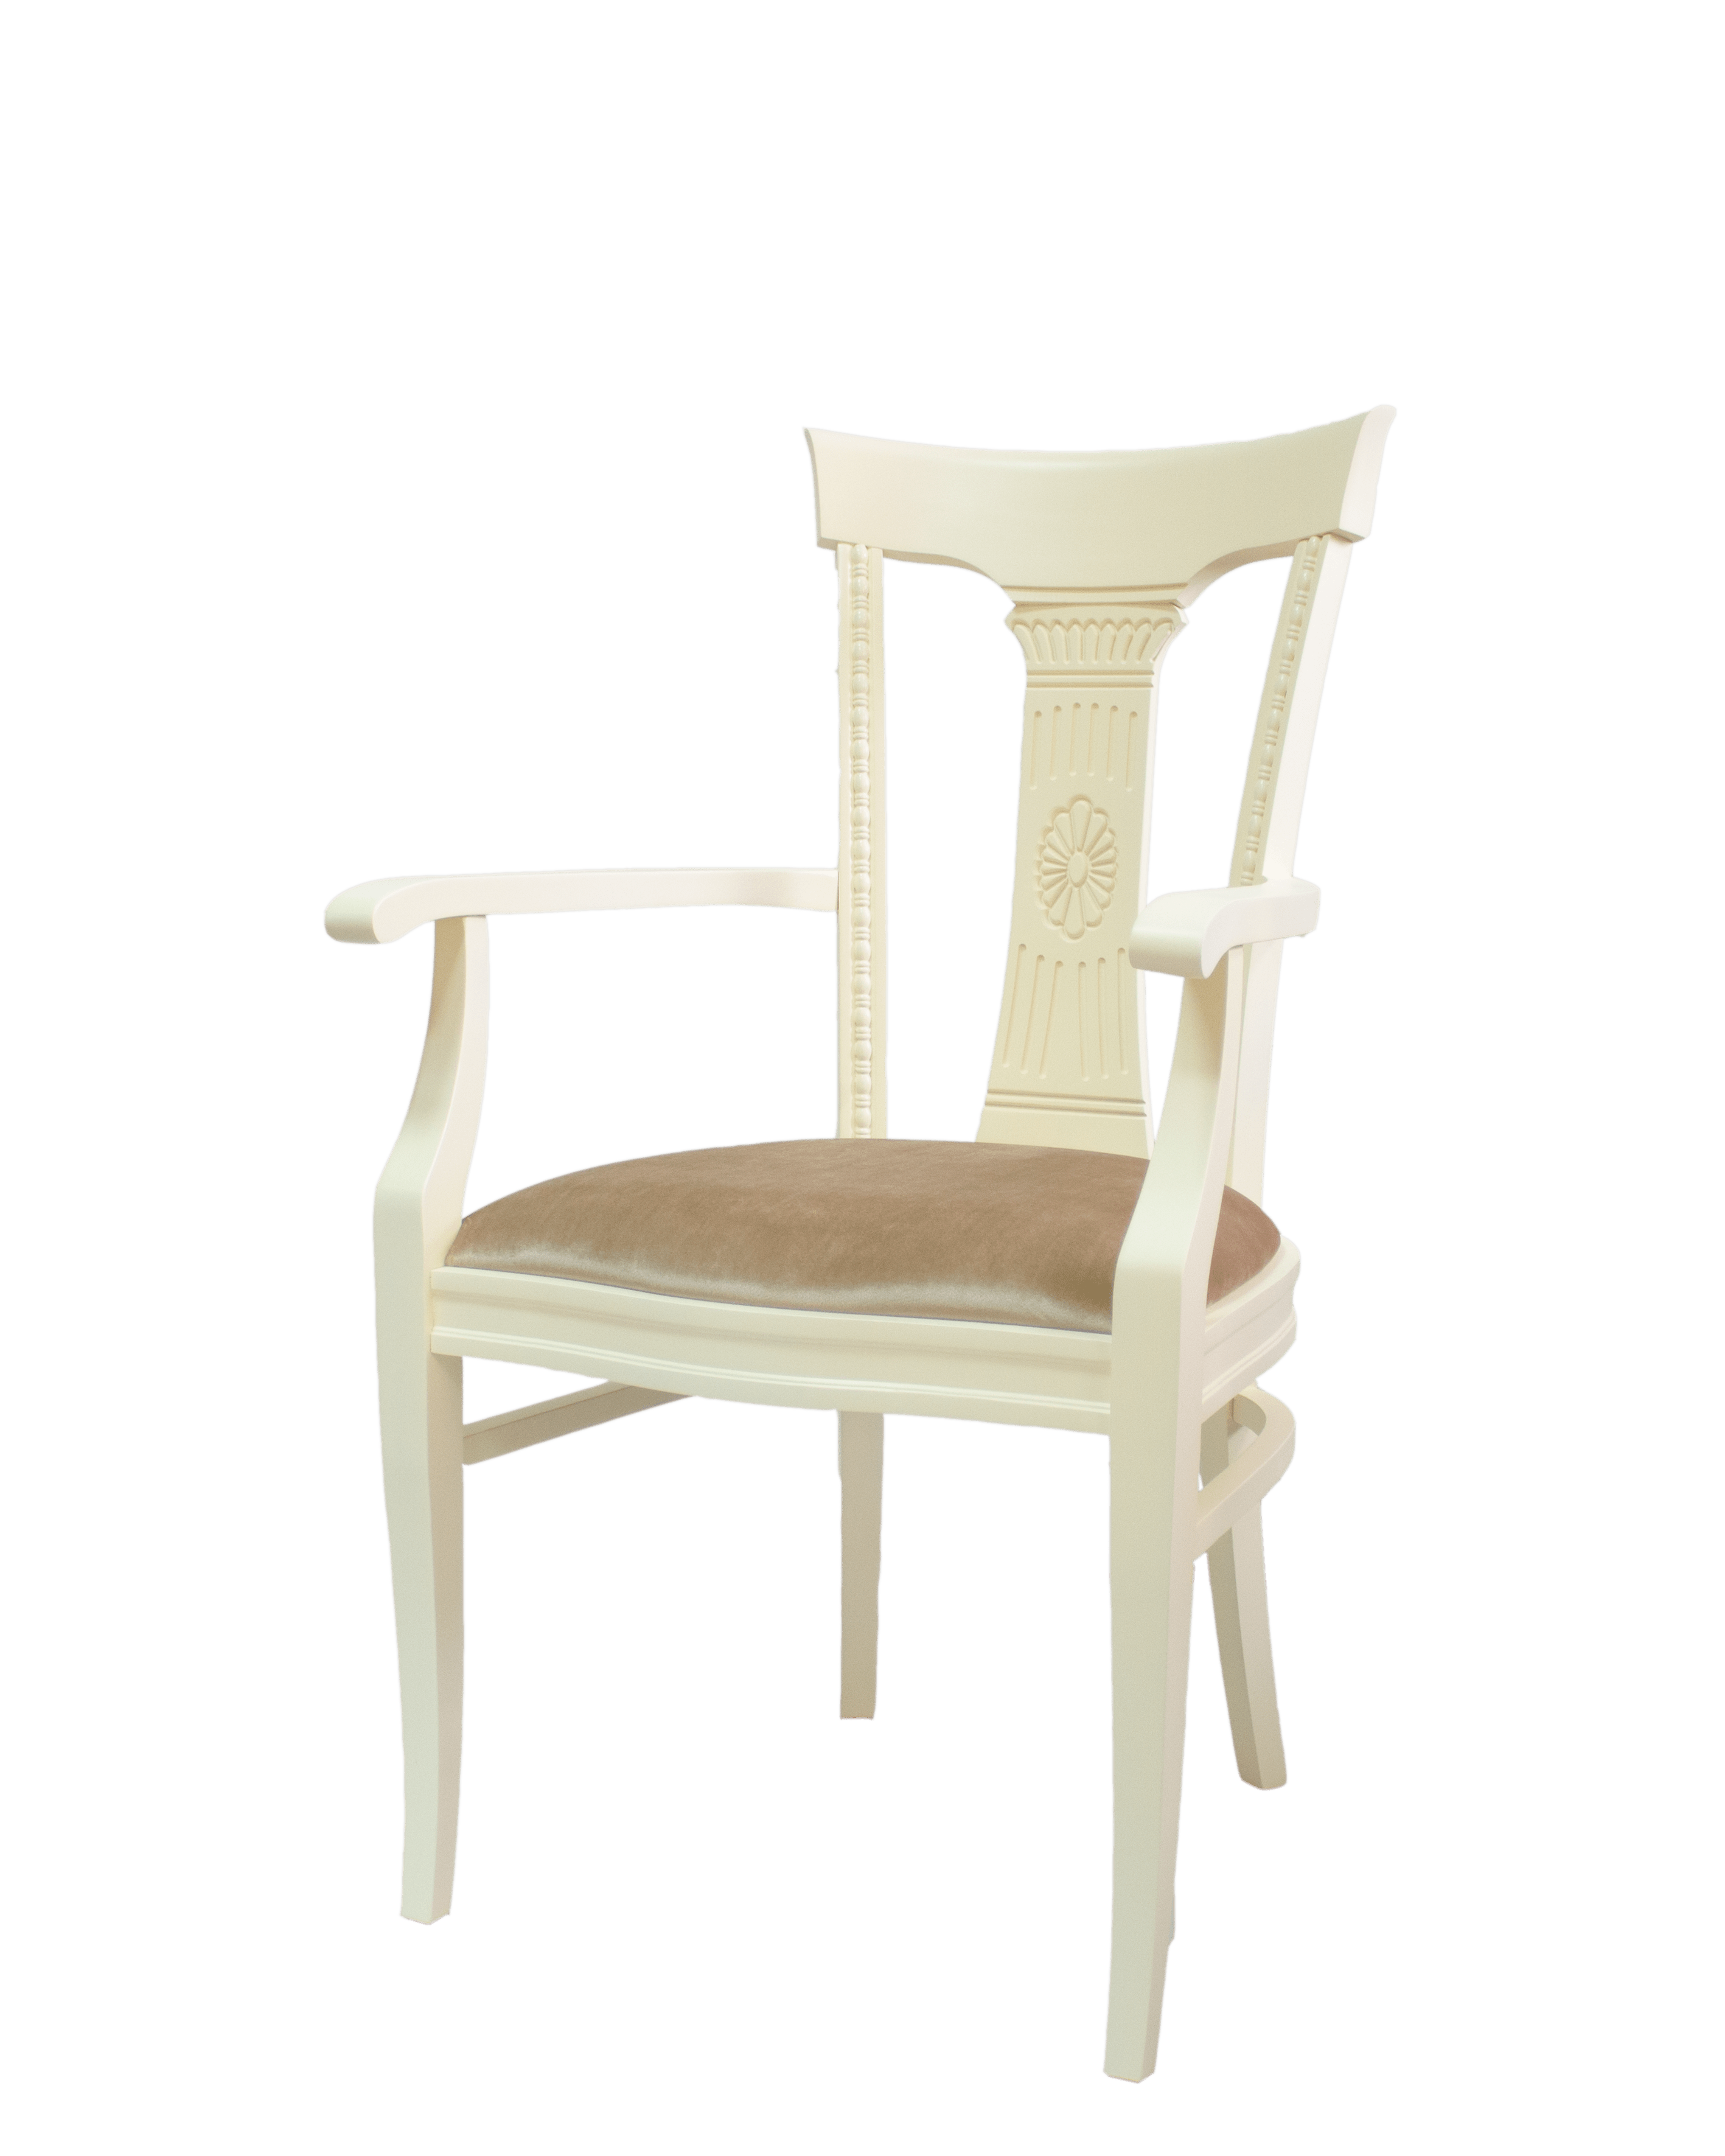 Стул-кресло Митос Р4А